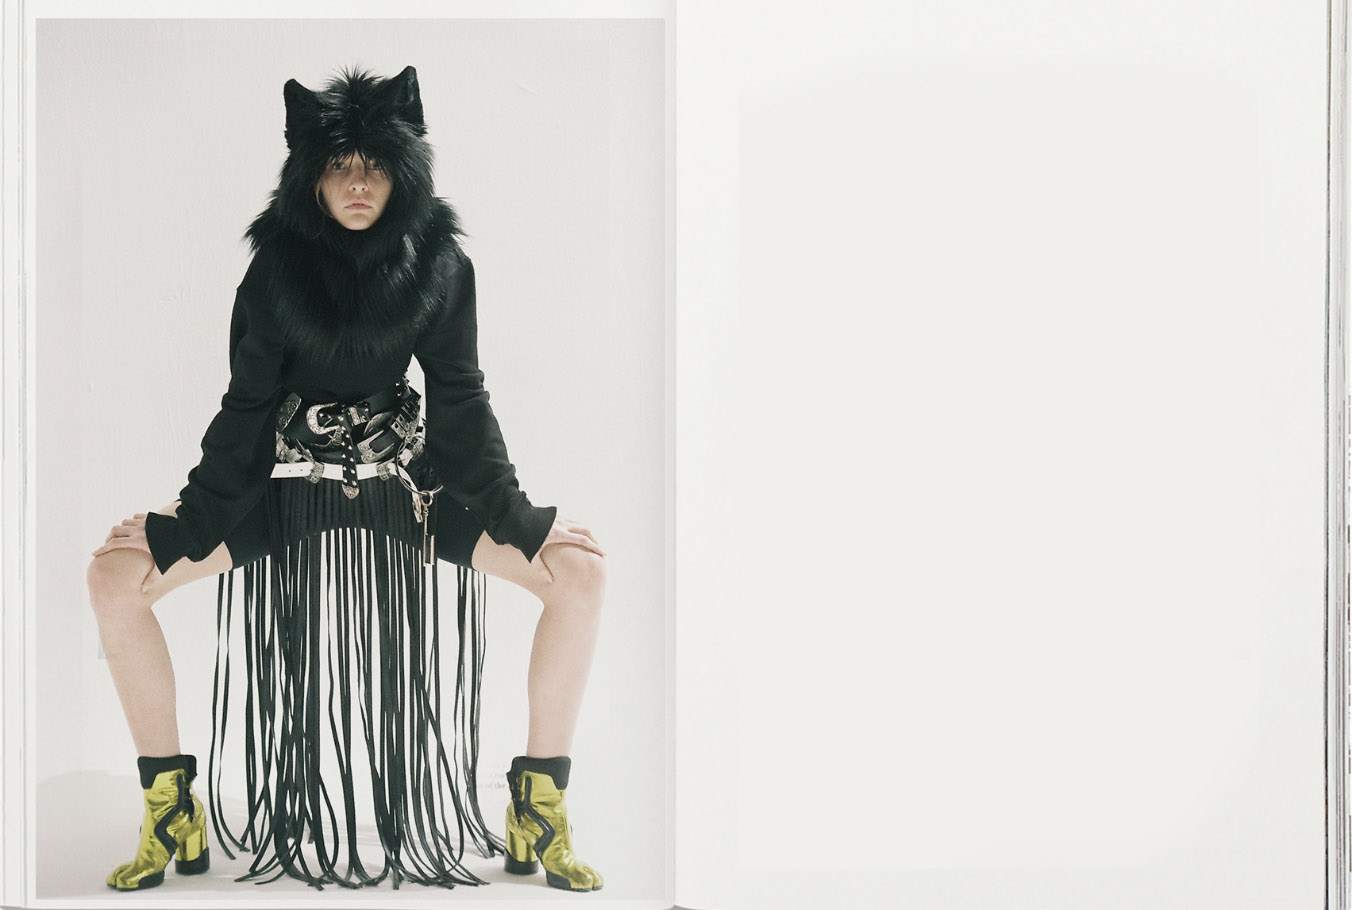 wolf hat  STYLIST'S OWN  look  GUNTAS  belts  MANC  chain  GIVENCHY  heels  MARGIELA